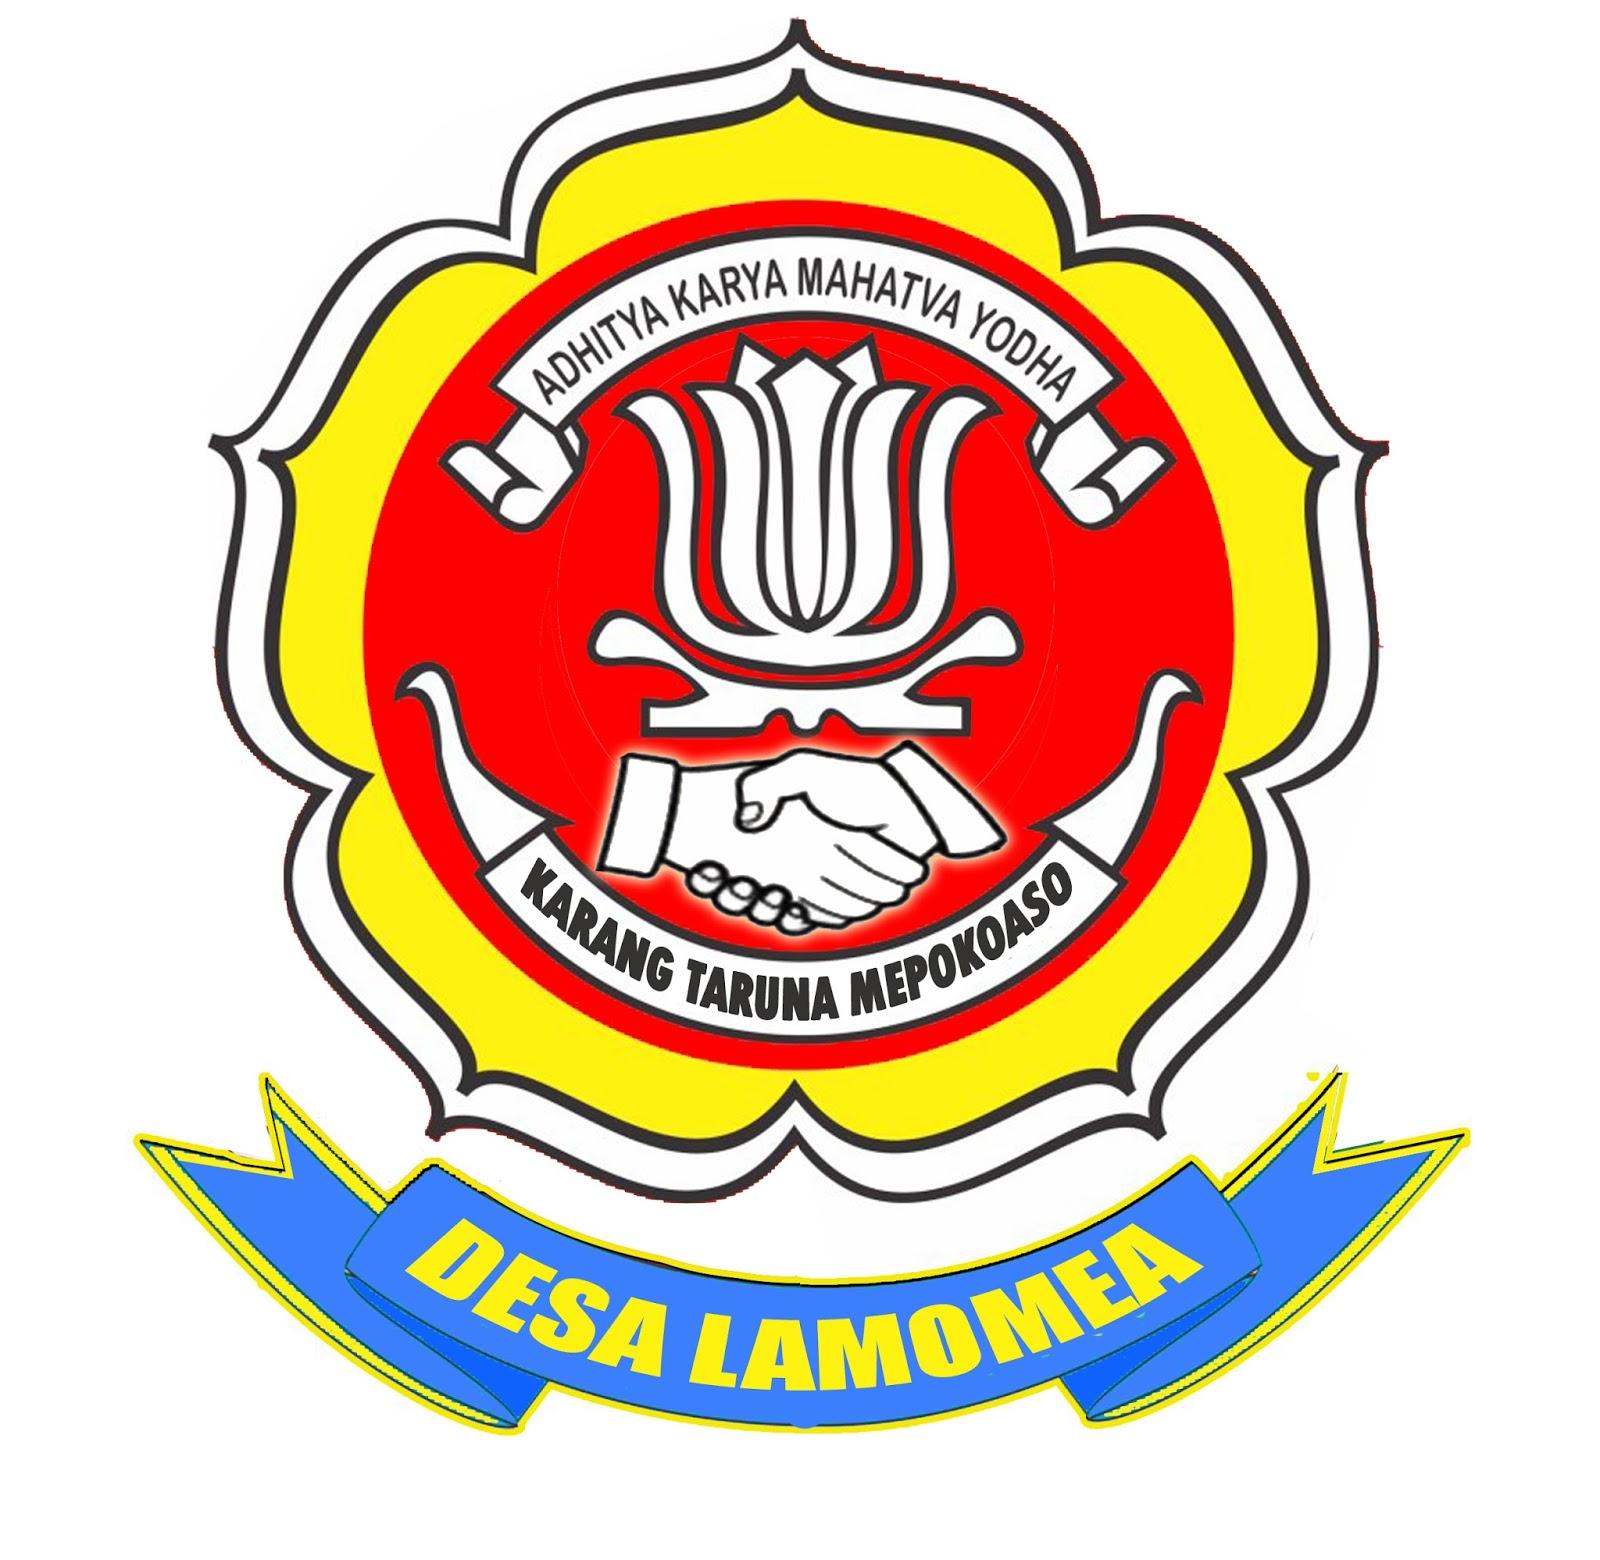 Karang Taruna Mepokoaso Desa Lamomea Logo Gambar